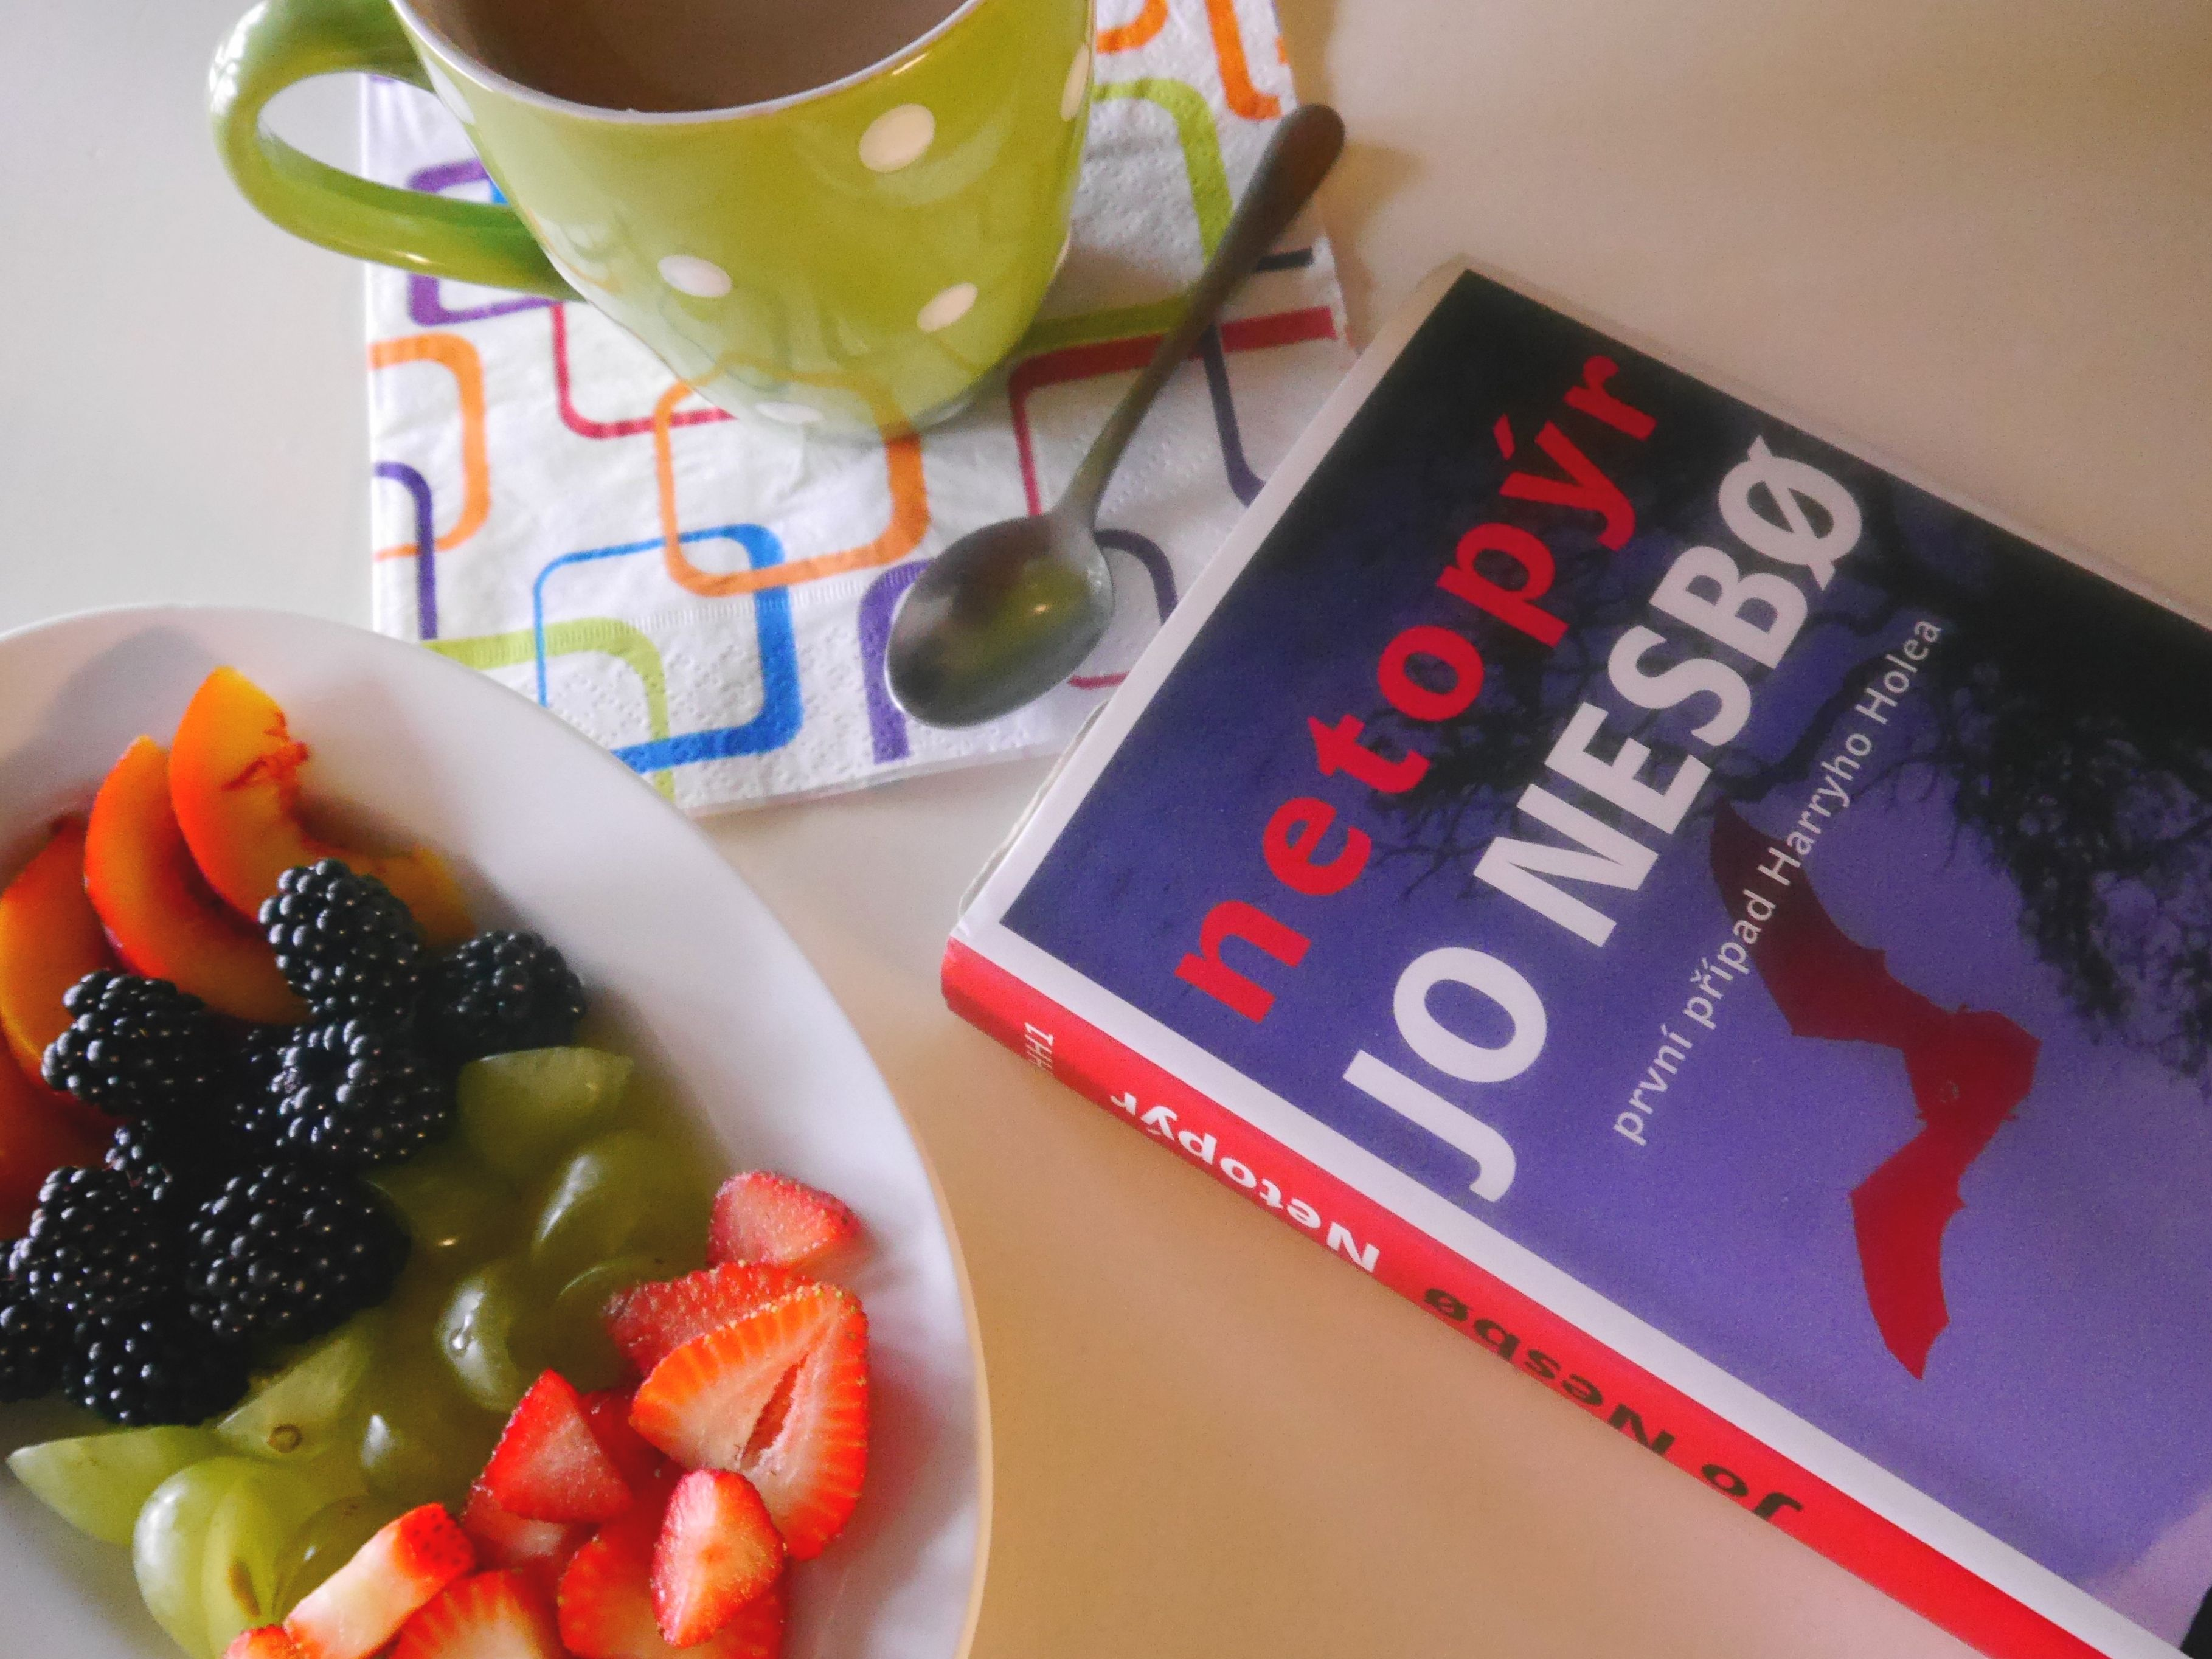 Jo Nesbo, coffee and fresh fruit!